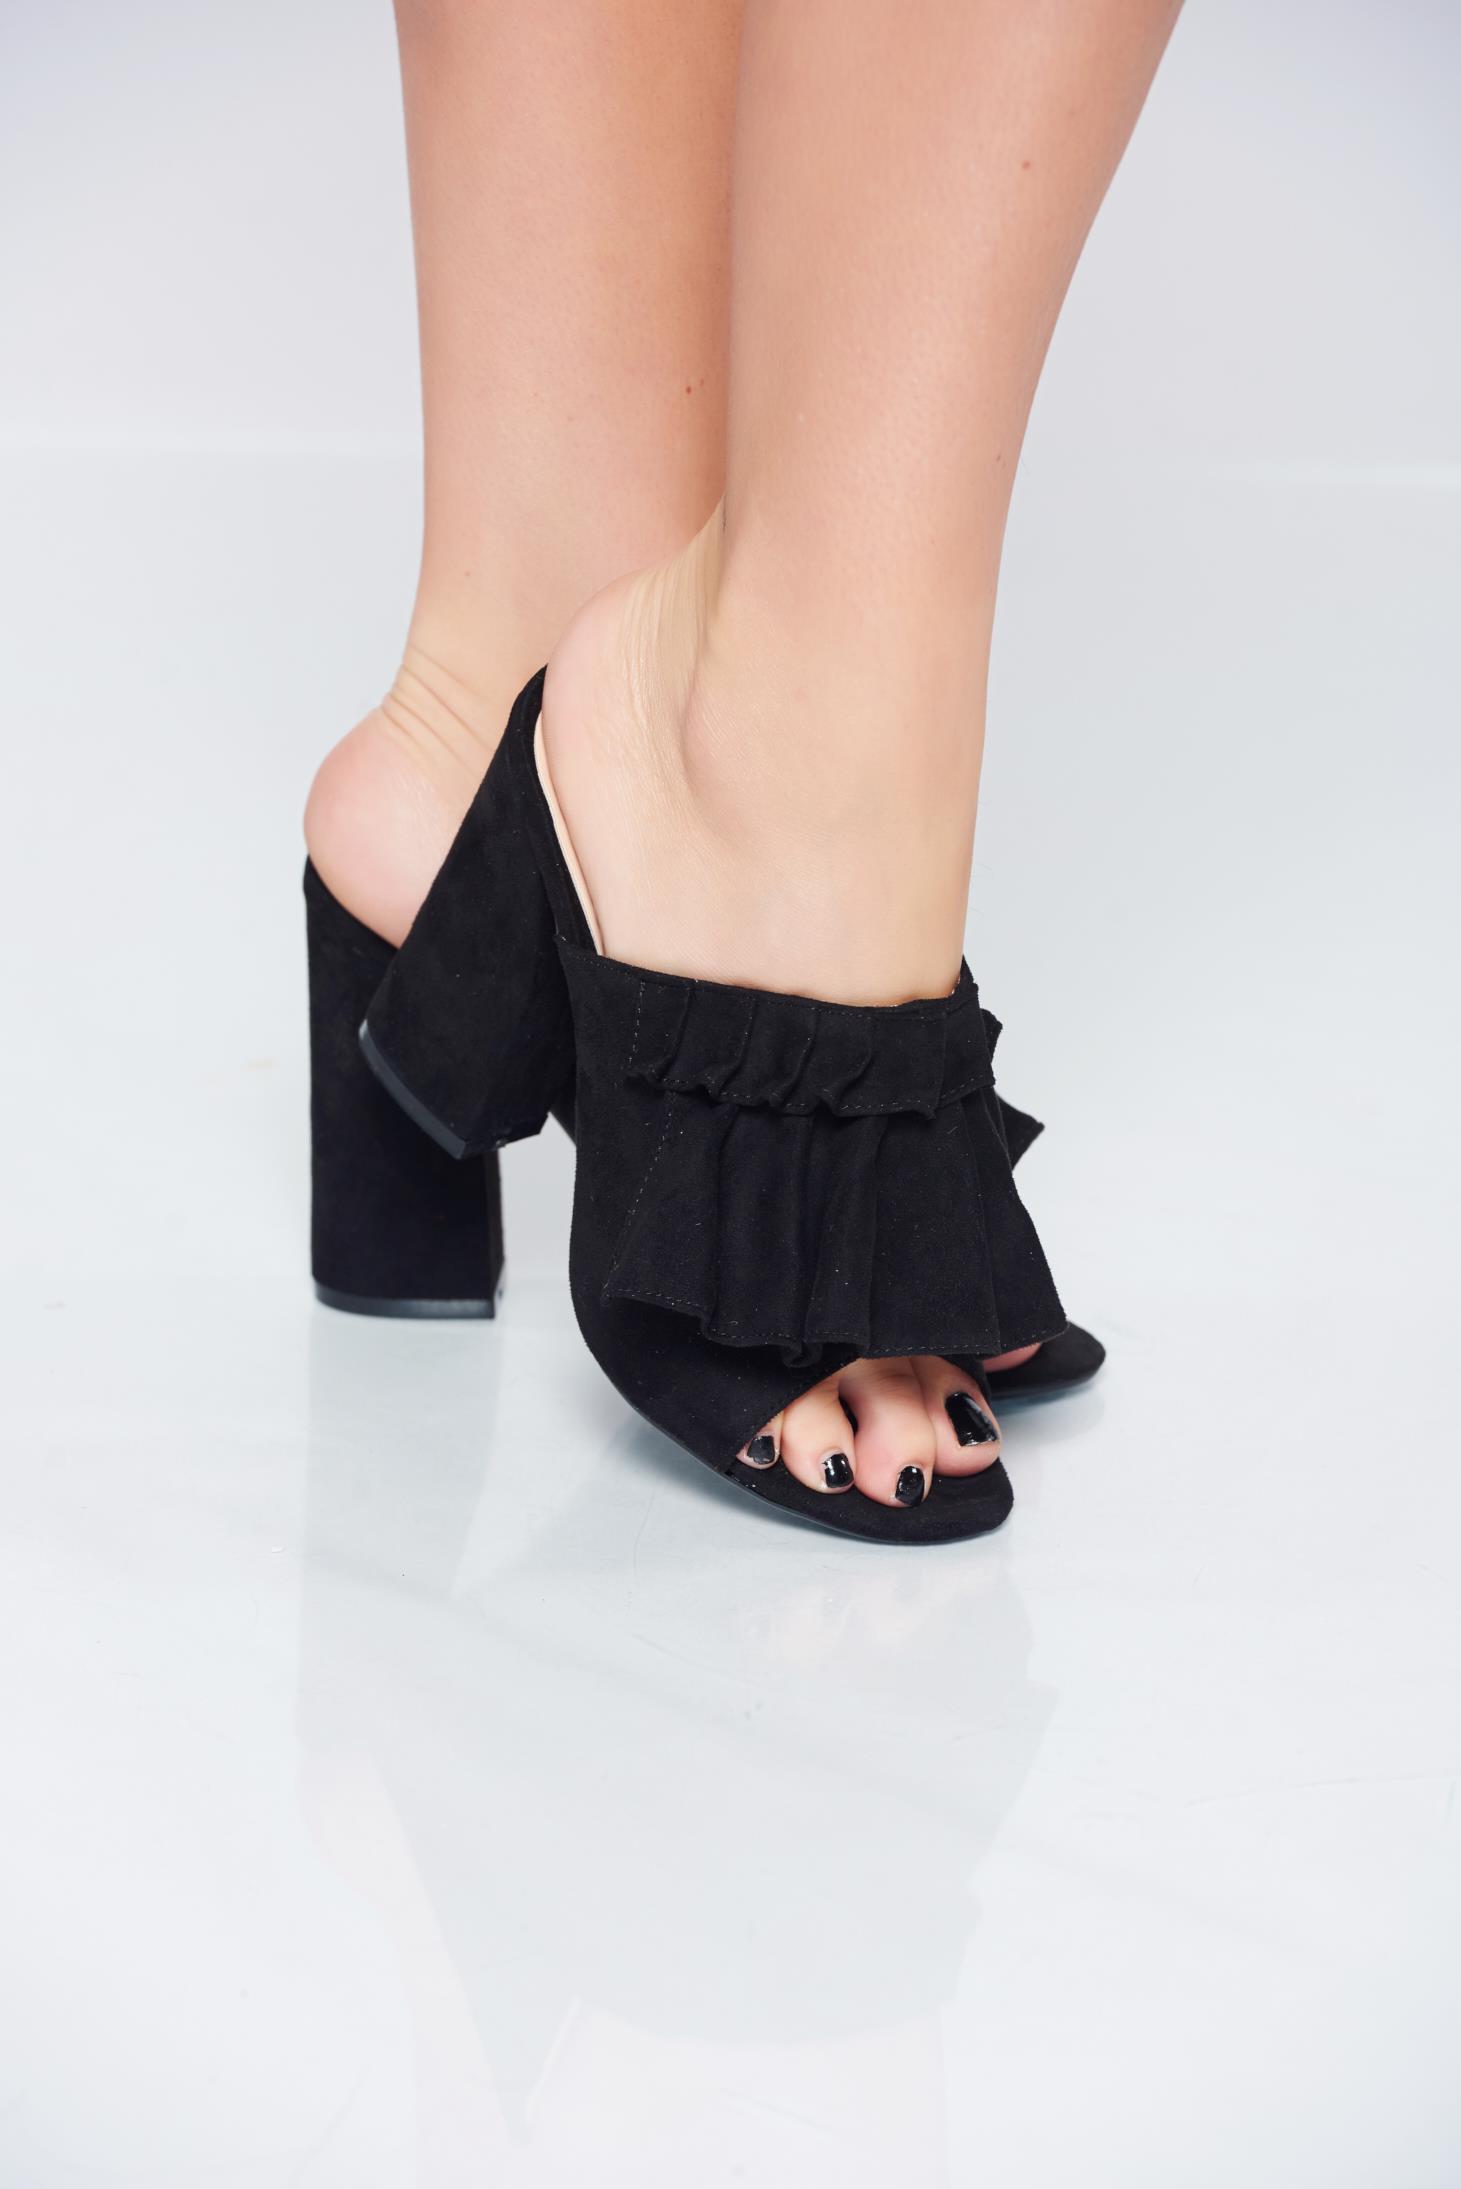 Black high heels sandals with square heels